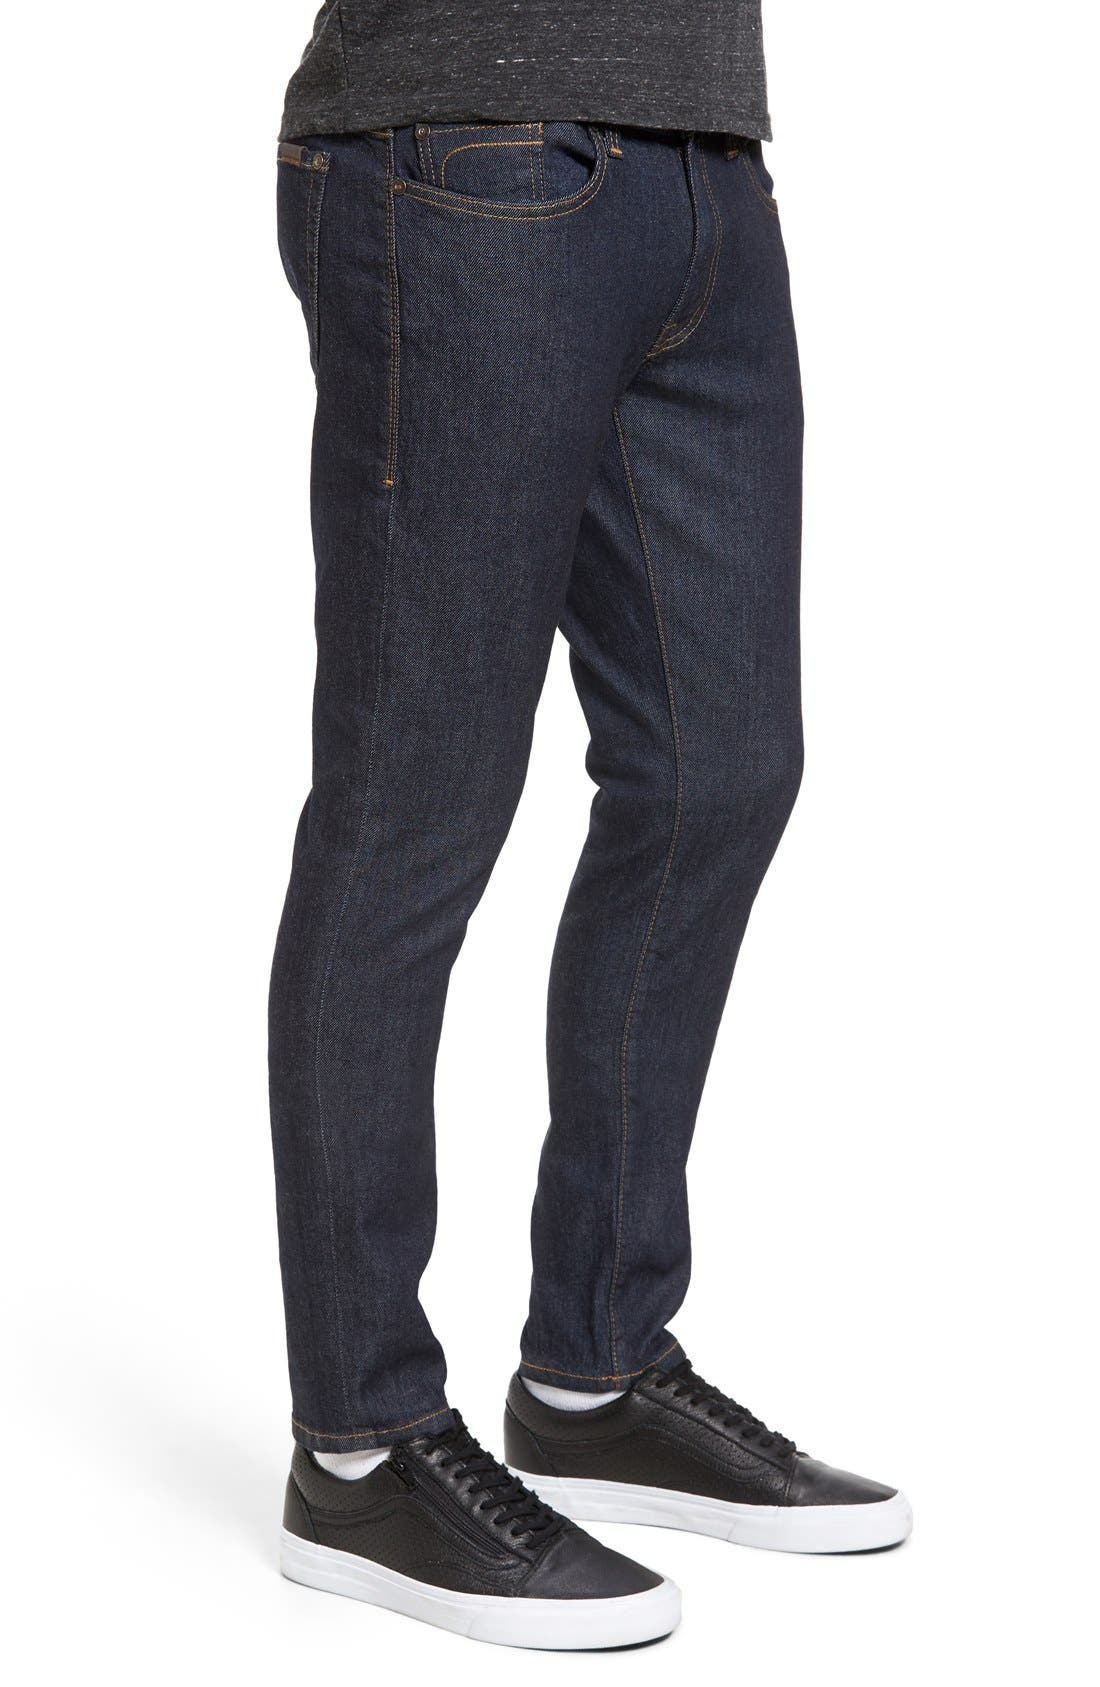 Vantage Skinny Fit Jeans,                             Alternate thumbnail 7, color,